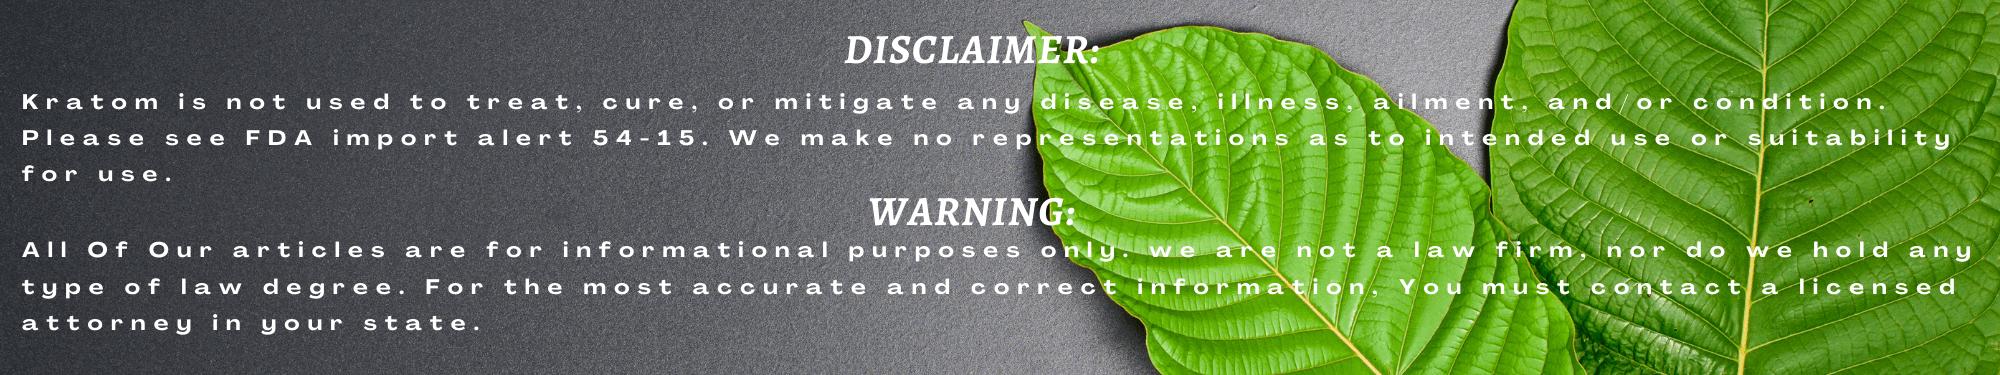 Disclaimer and Warning